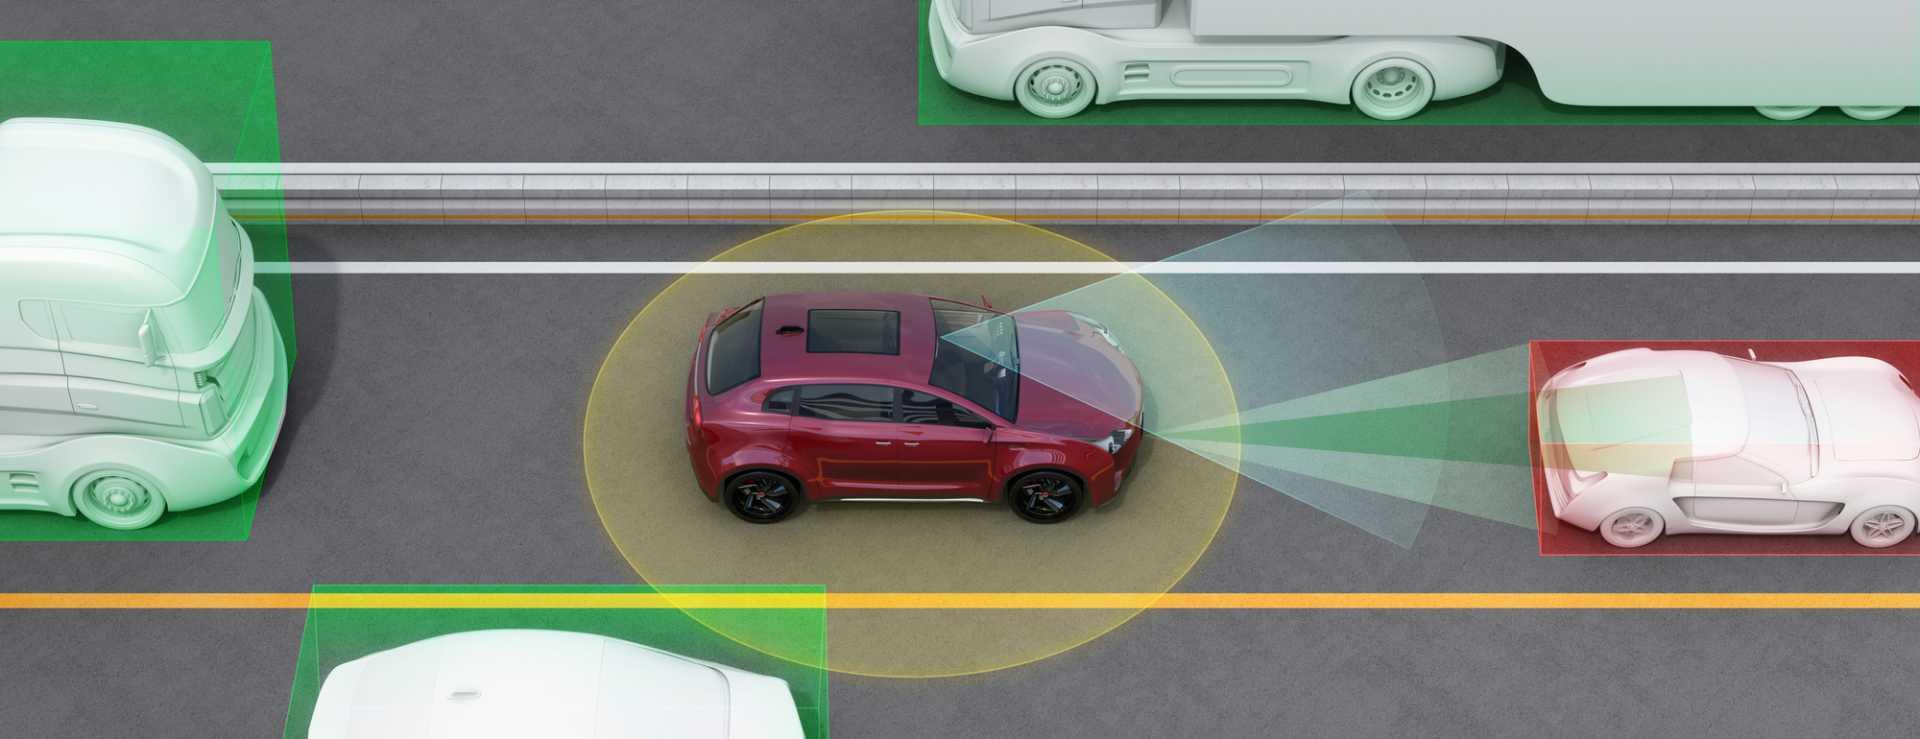 Concept illustration for auto braking, lane keeping functions autonomous vehicles - image courtesy of Depositphotos.